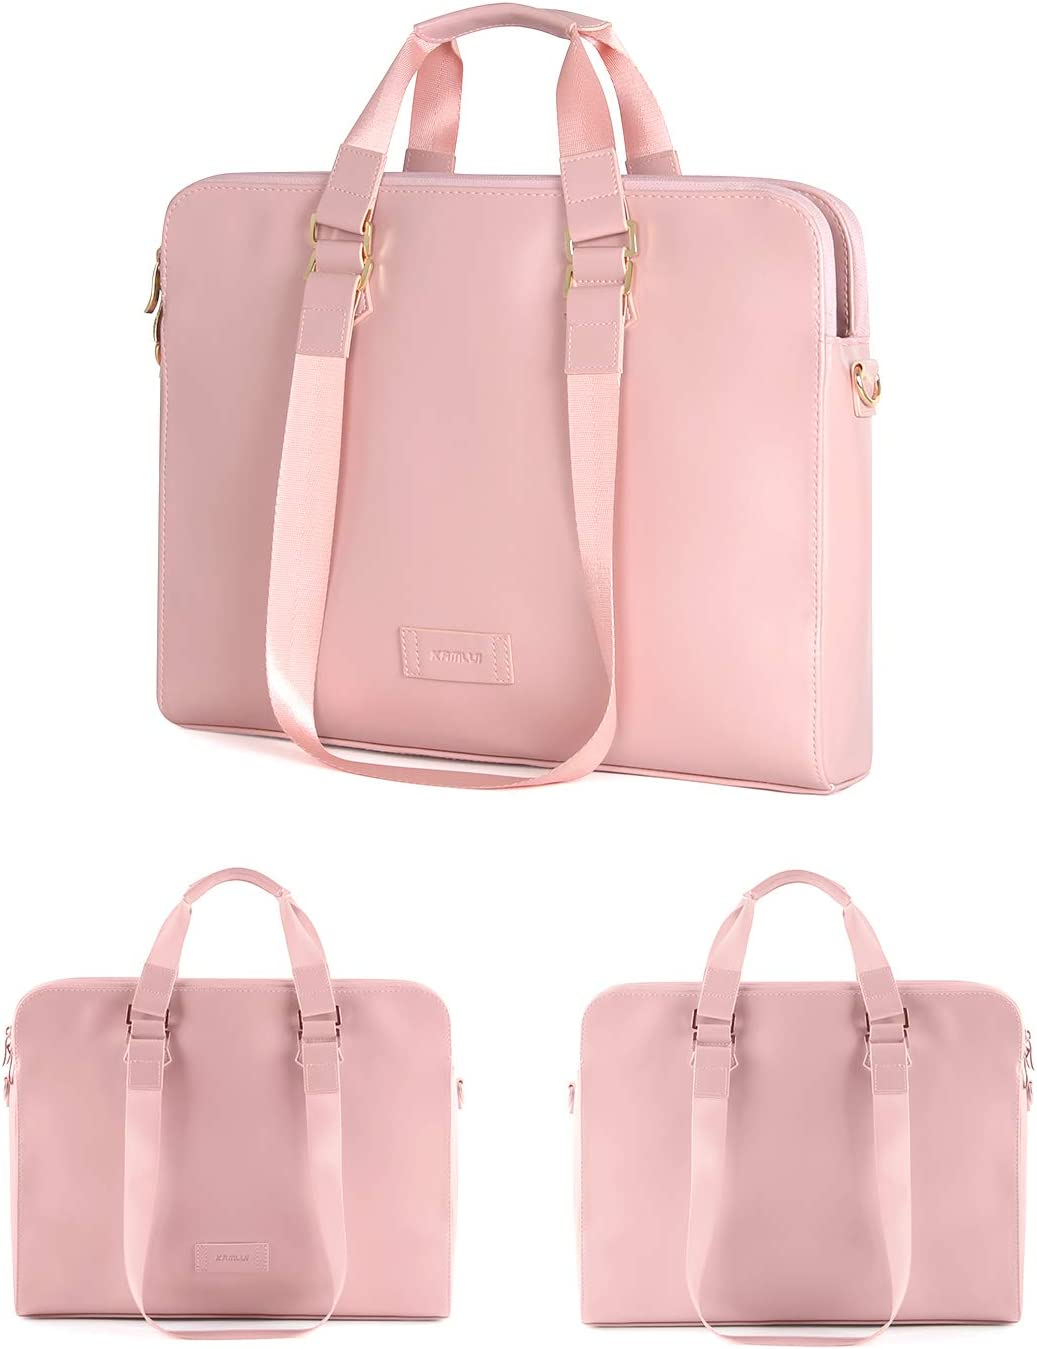 for Women PU Waterproof Fashion Shoulder Messenger Computer Laptop Case (Pink) Kamlui 15.6 Inch Laptop Bag